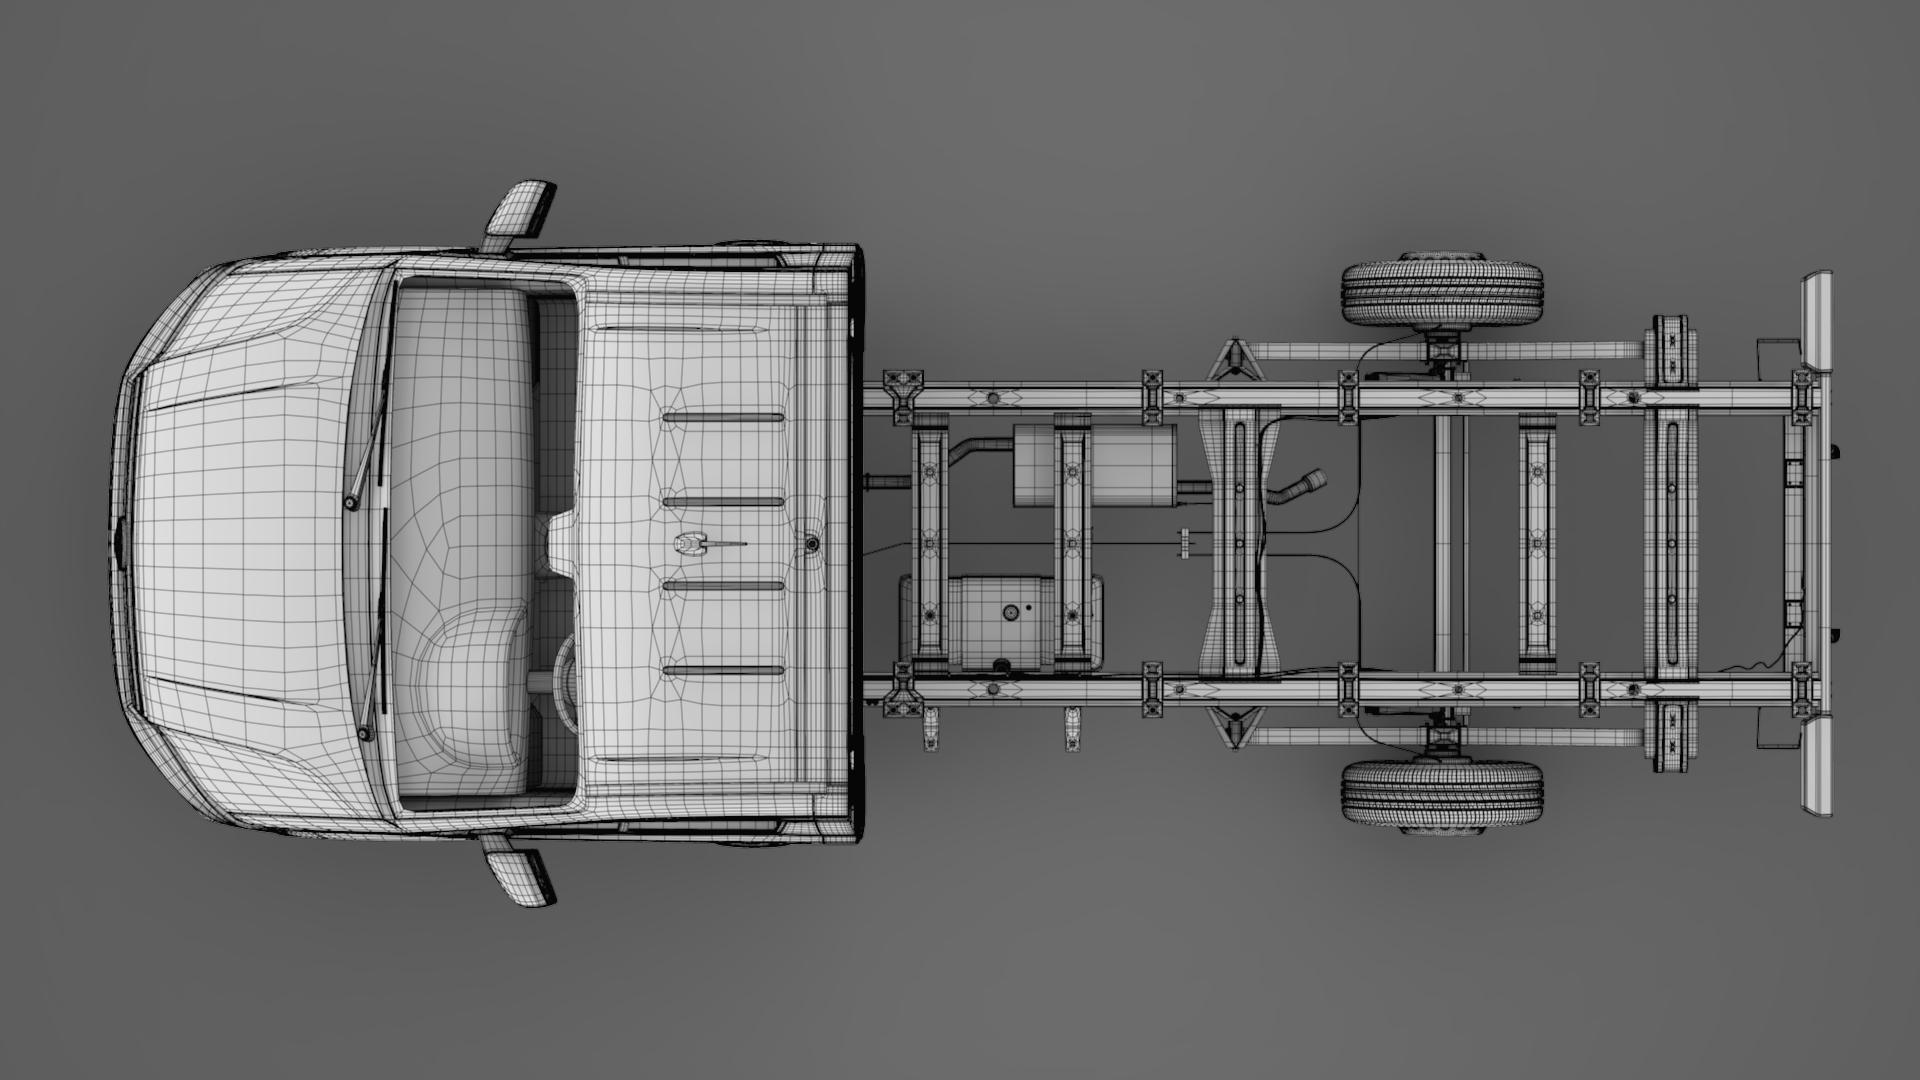 wv crafter chassis single-cab 2017 3d model max fbx c4d lwo ma mb hrc xsi obj 275108